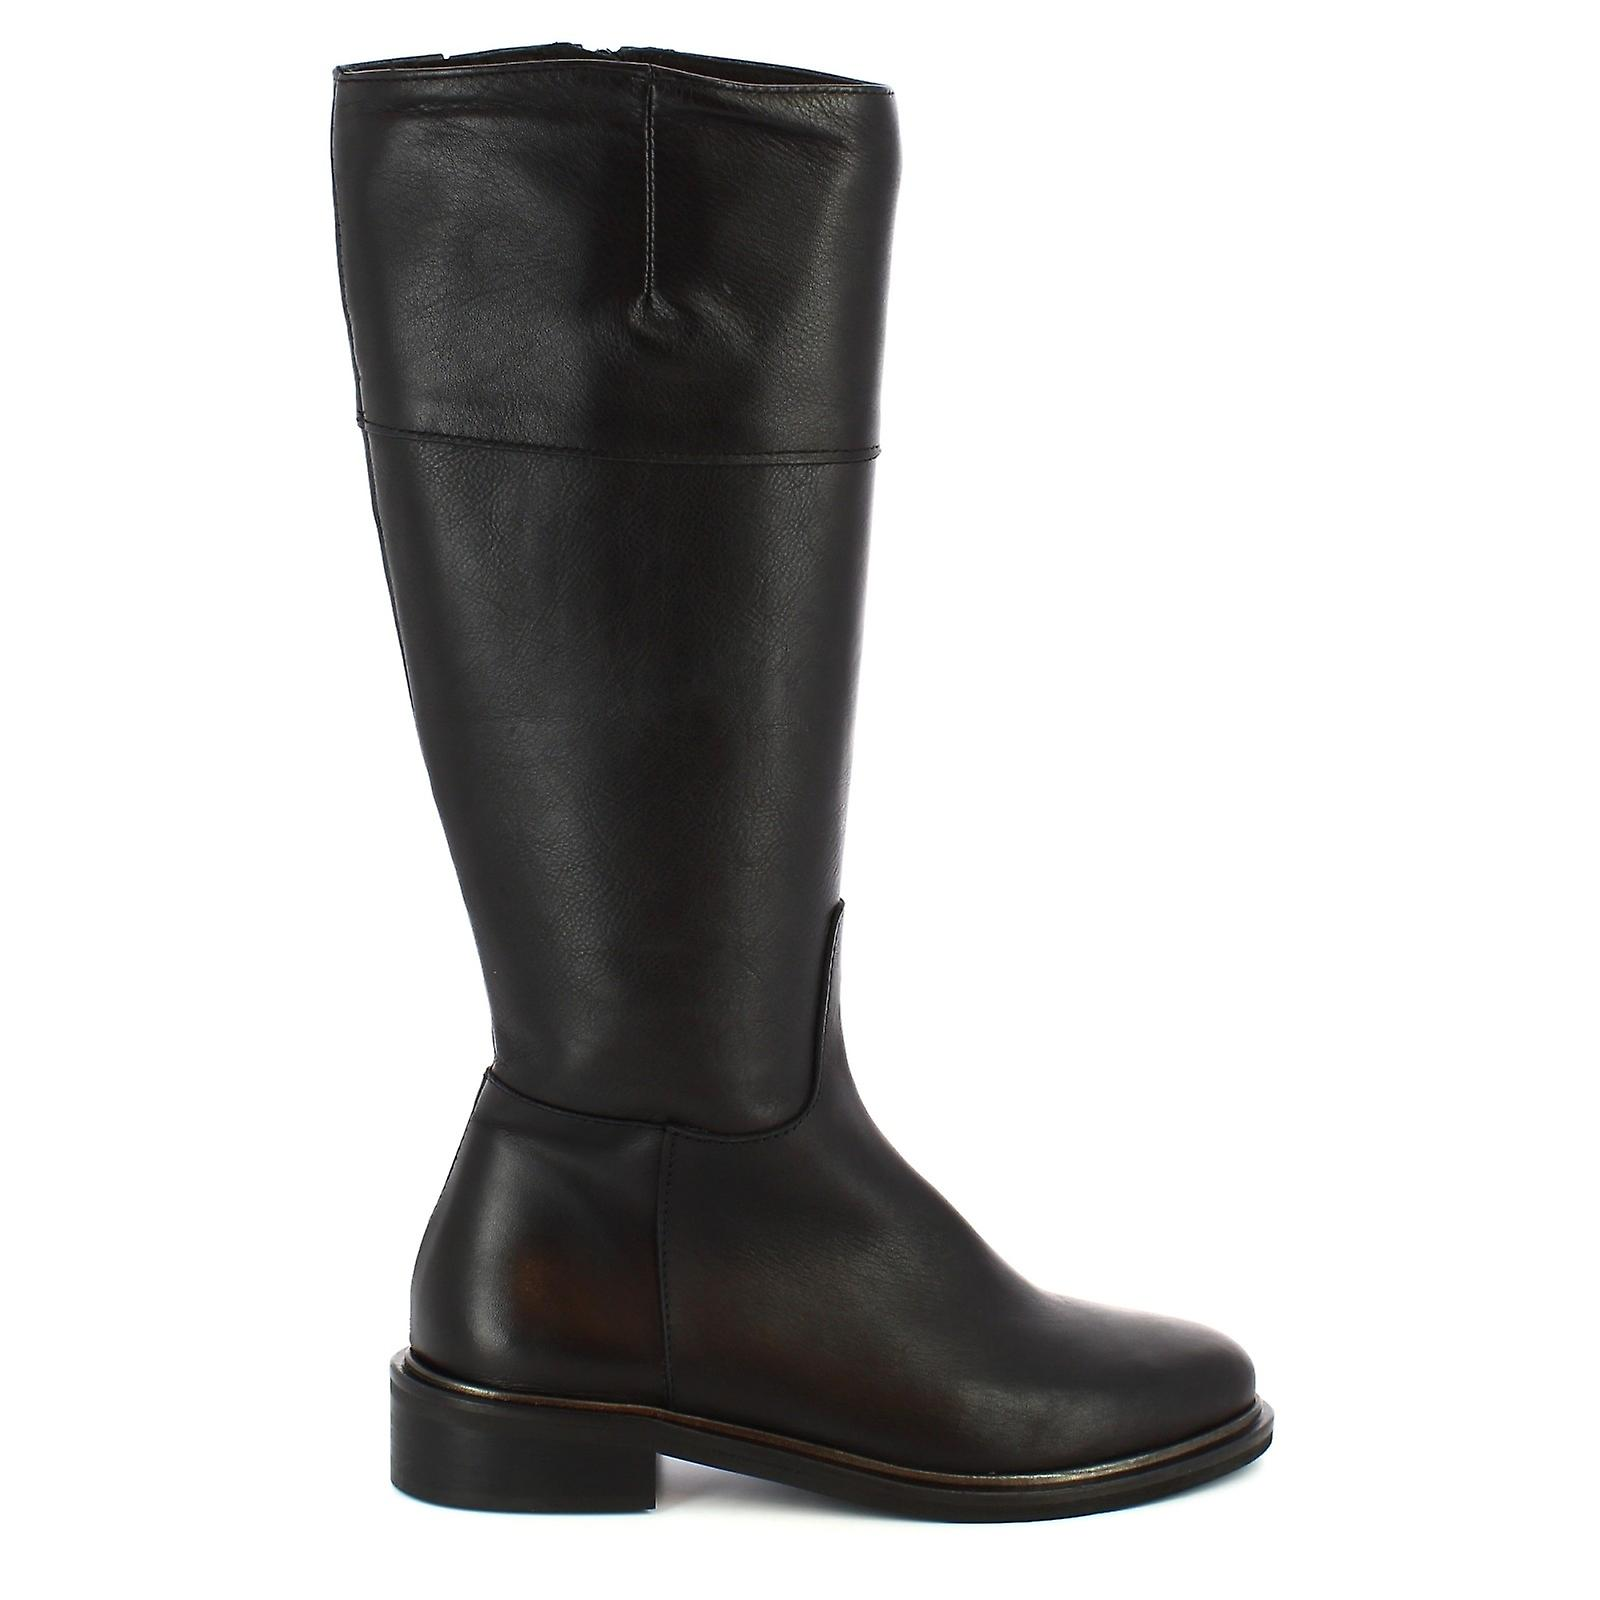 Leonardo Shoes Women's handmade booties black calf leather with side zip k0qaY